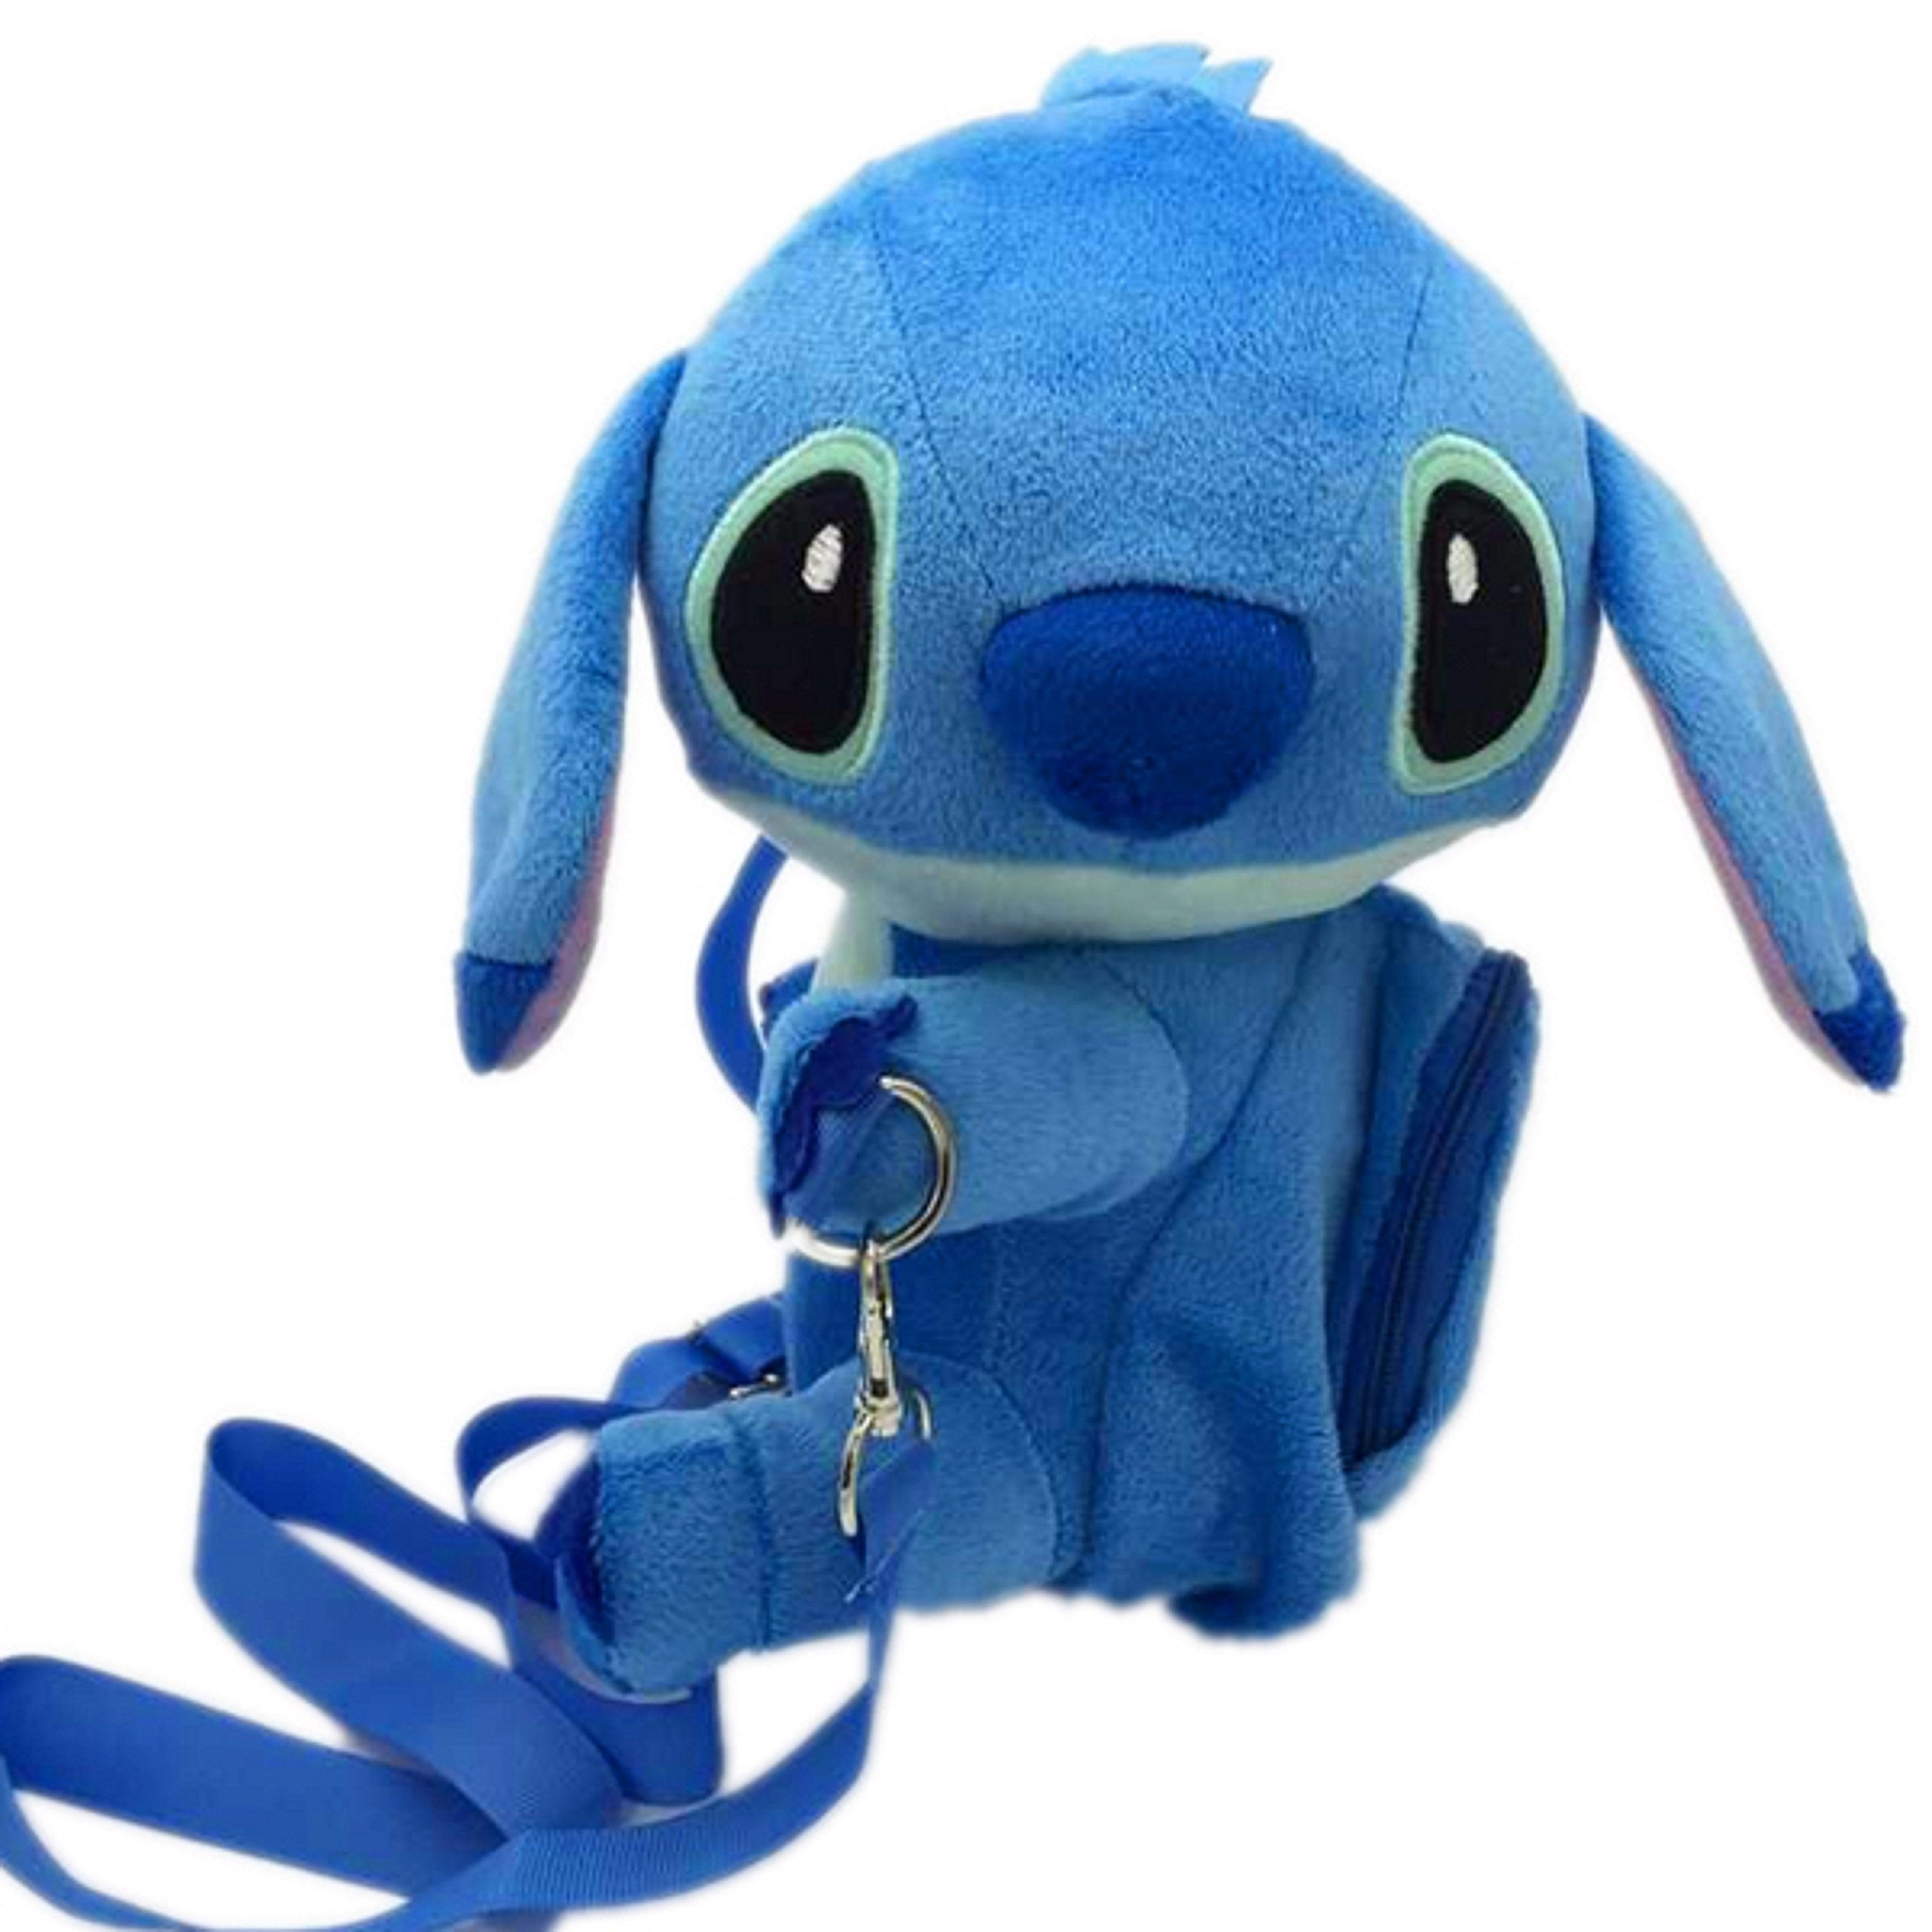 Disney Stitch Set . Soft Plush Crossbody/Shoulder Mini Bag with Small Pocket + Stitch Watch For kids. H 9''. Limited Edition. by LILO & STITCH (Image #6)